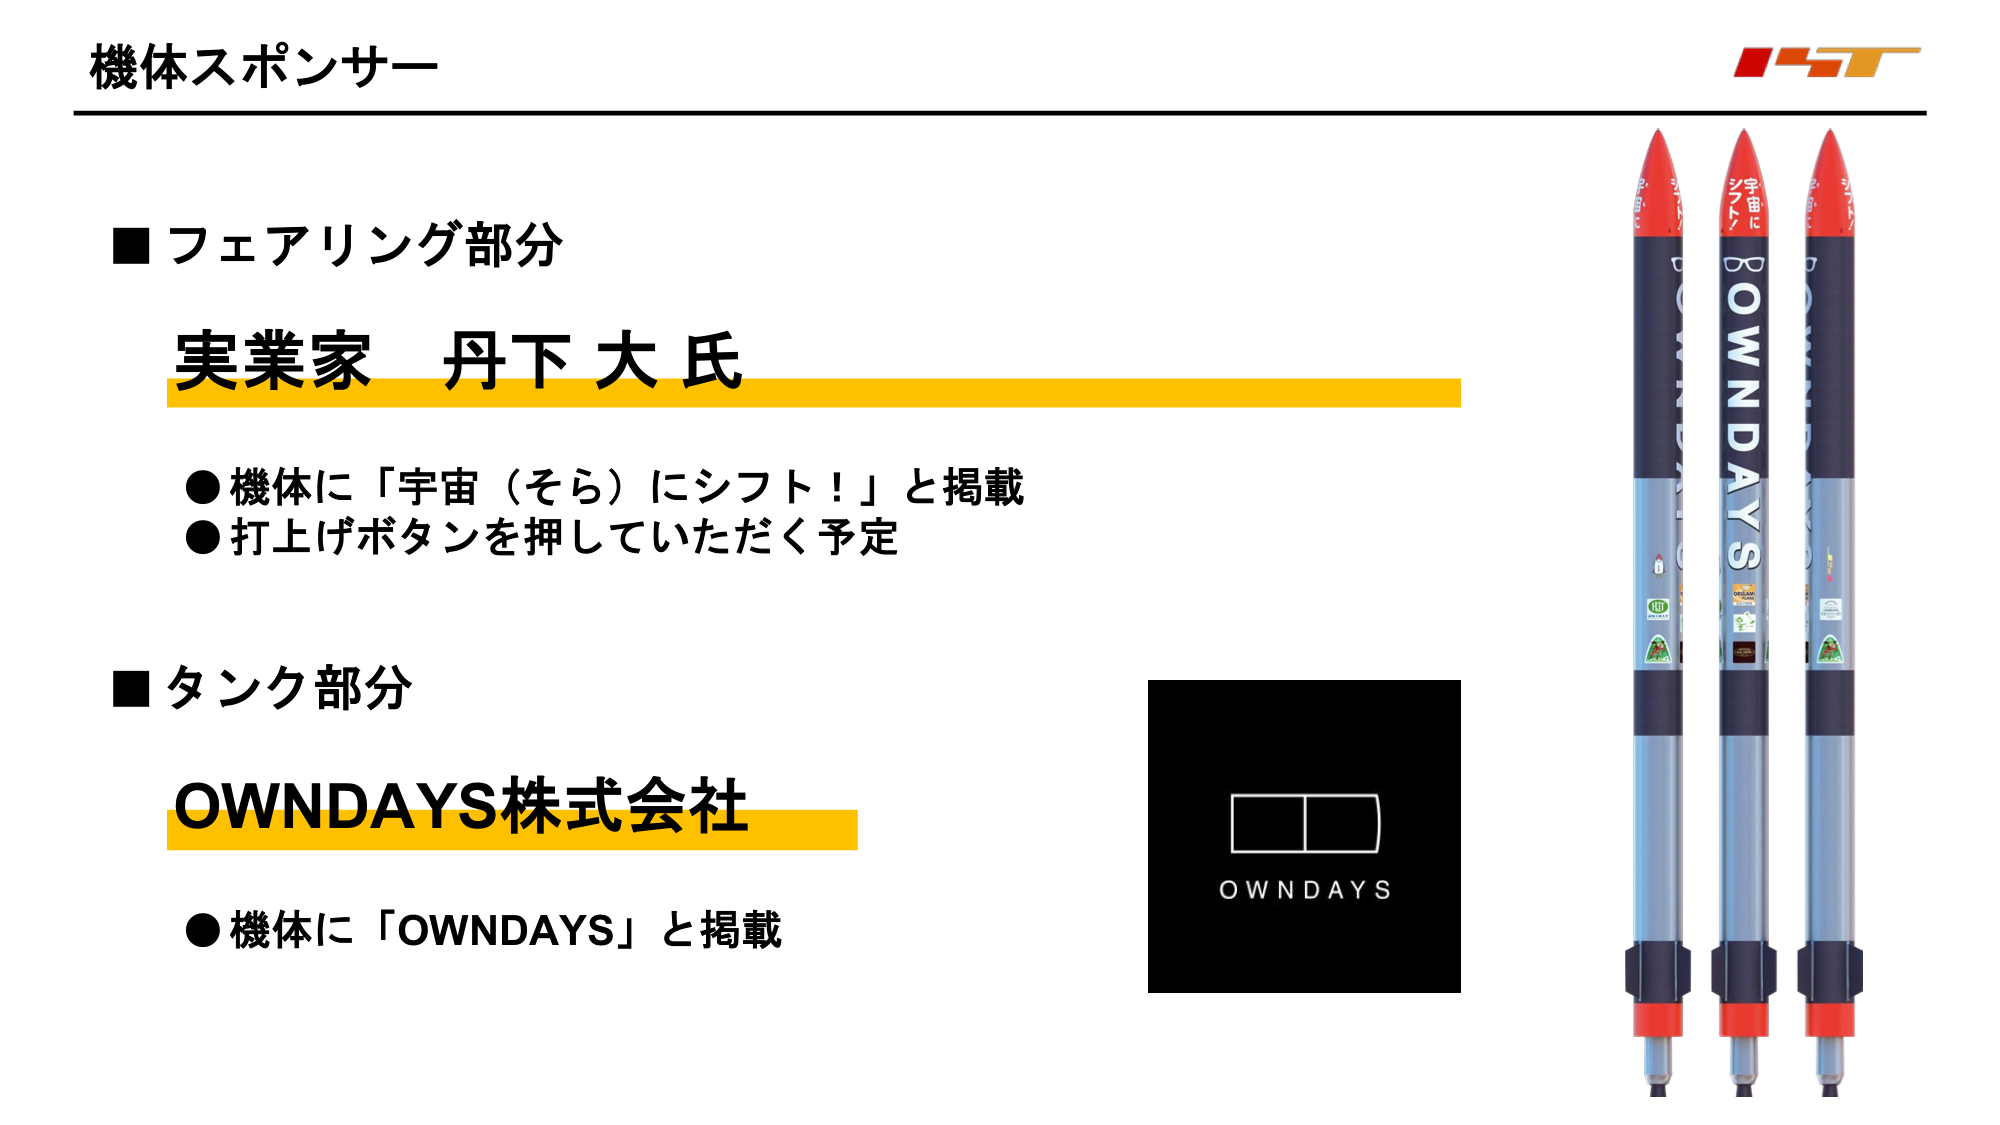 f:id:Imamura:20190628161128p:plain